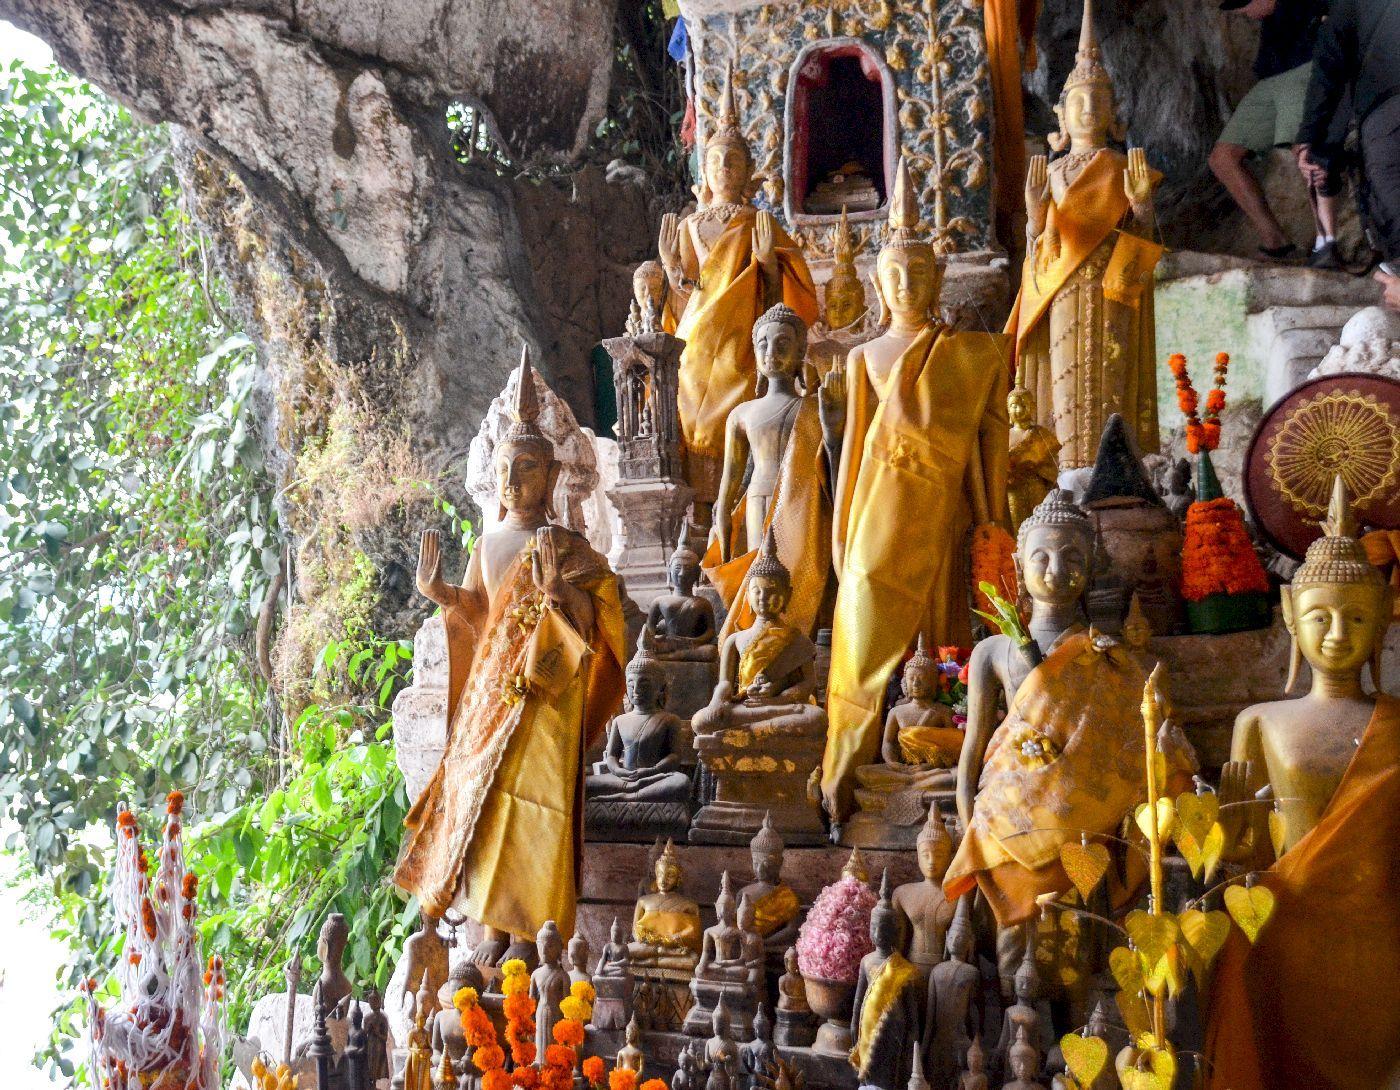 https://blogvoyages.fr/wp-content/uploads/2018/01/Mekong-laos-0737.jpg